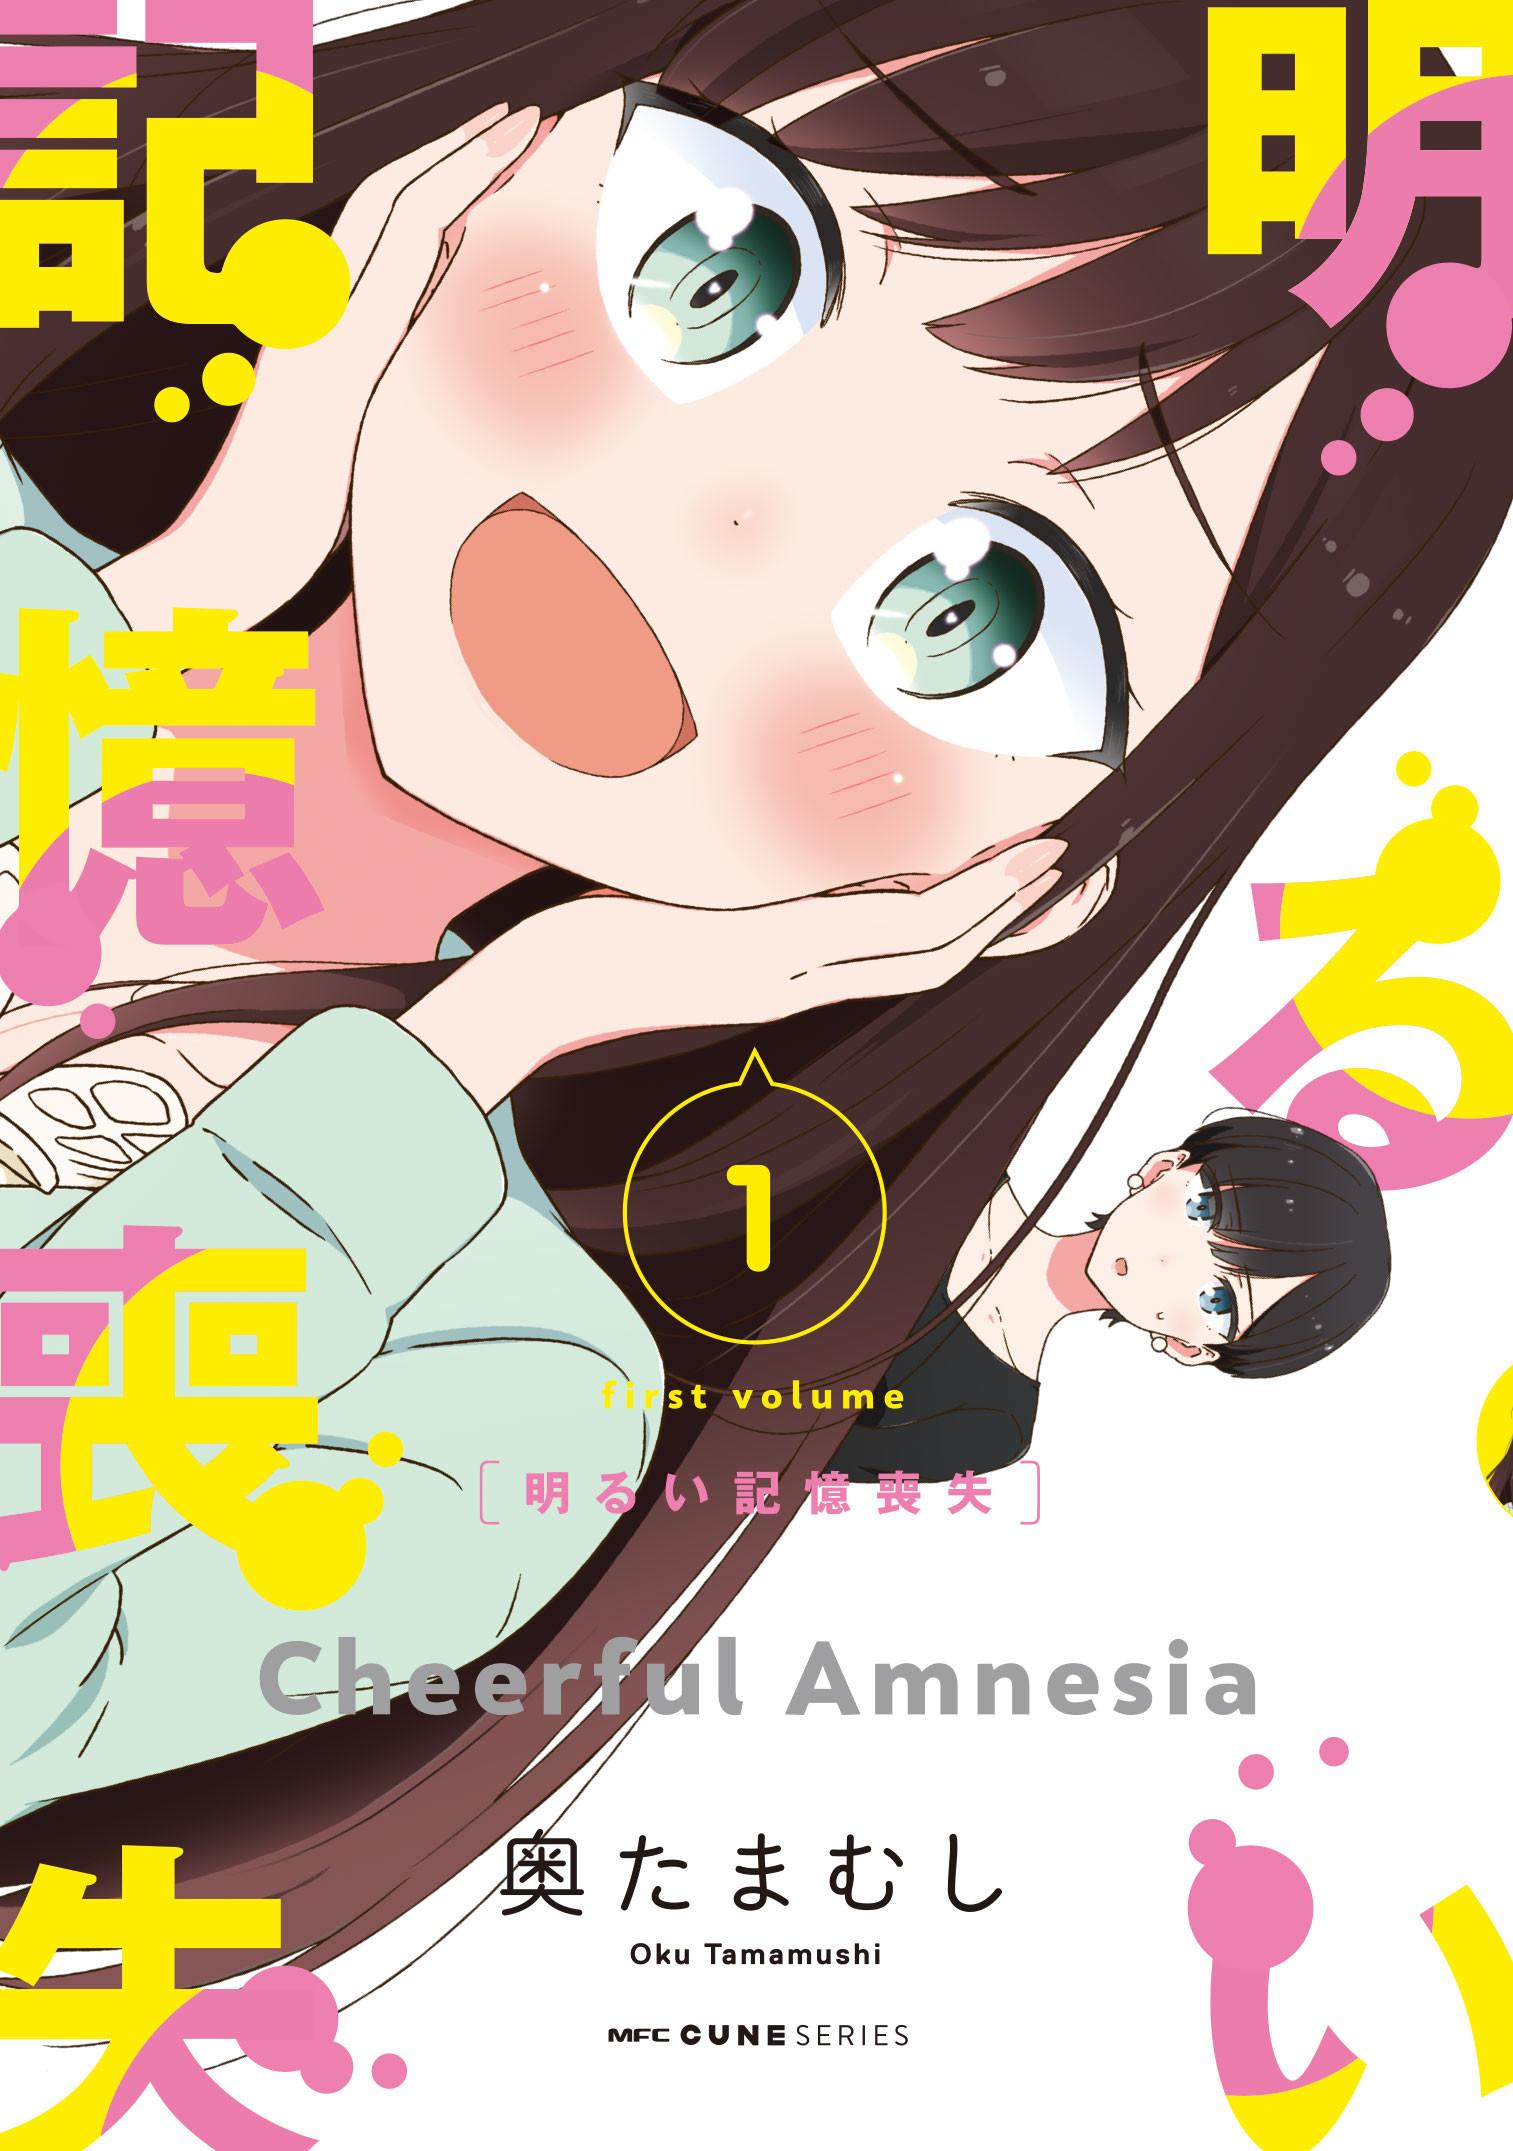 Cheerful Amnesia